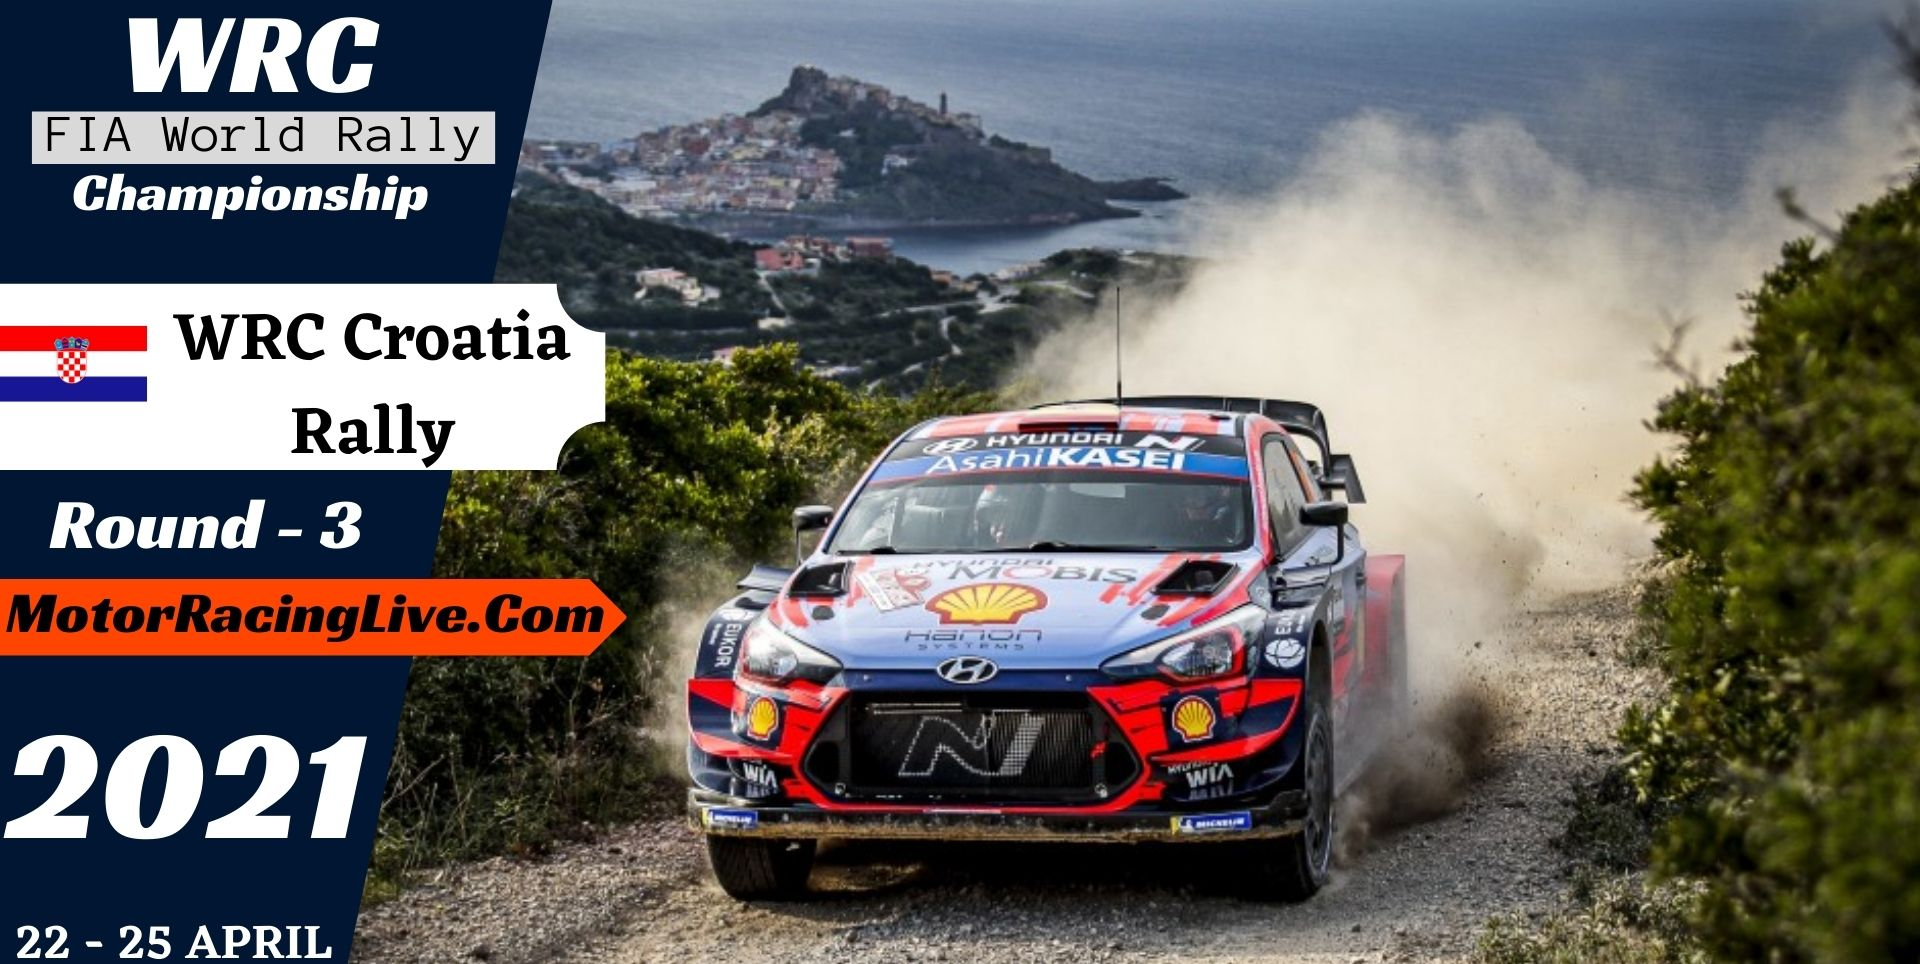 WRC Croatia Rally Round 3 Live Stream 2021